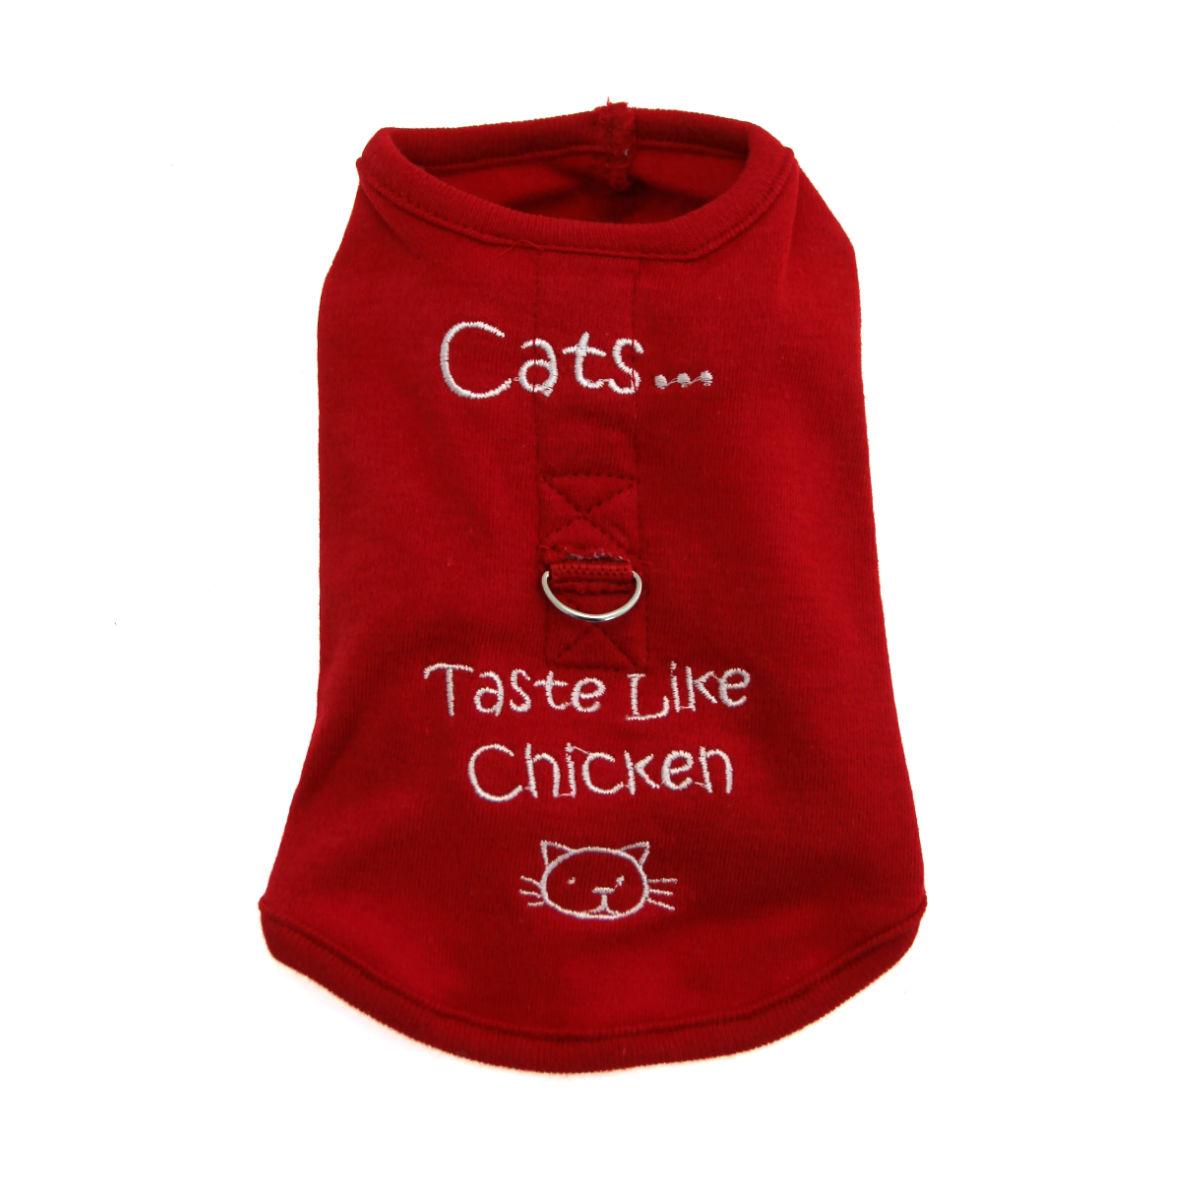 Cats Taste Like Chicken Dog Harness Shirt